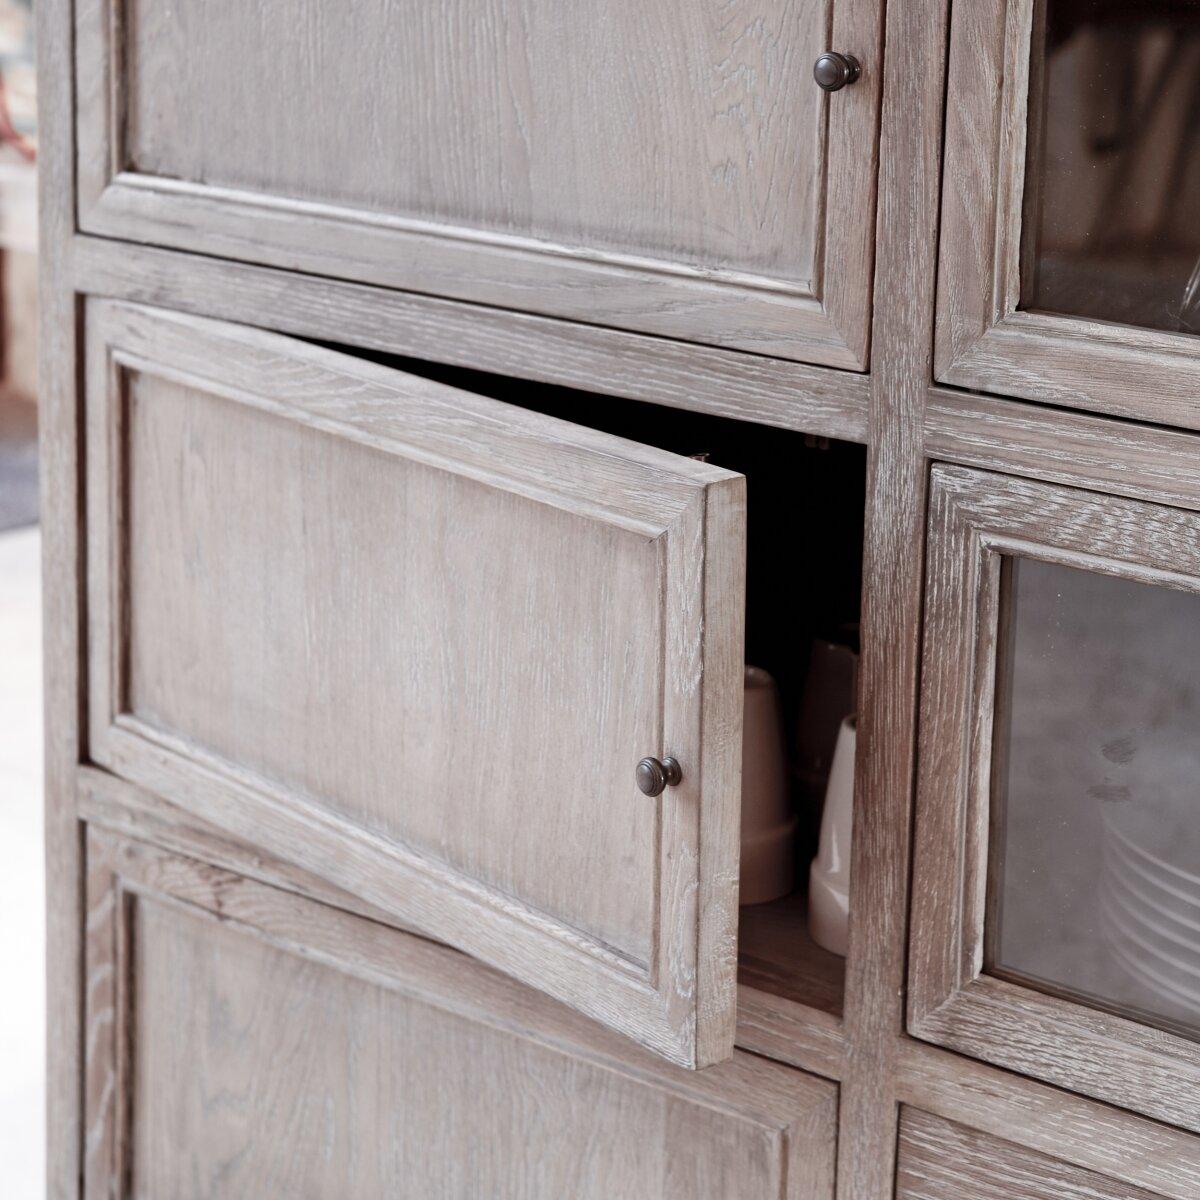 Tikamoon pablo 10 door 4 drawer sideboard reviews for Sideboard pablo